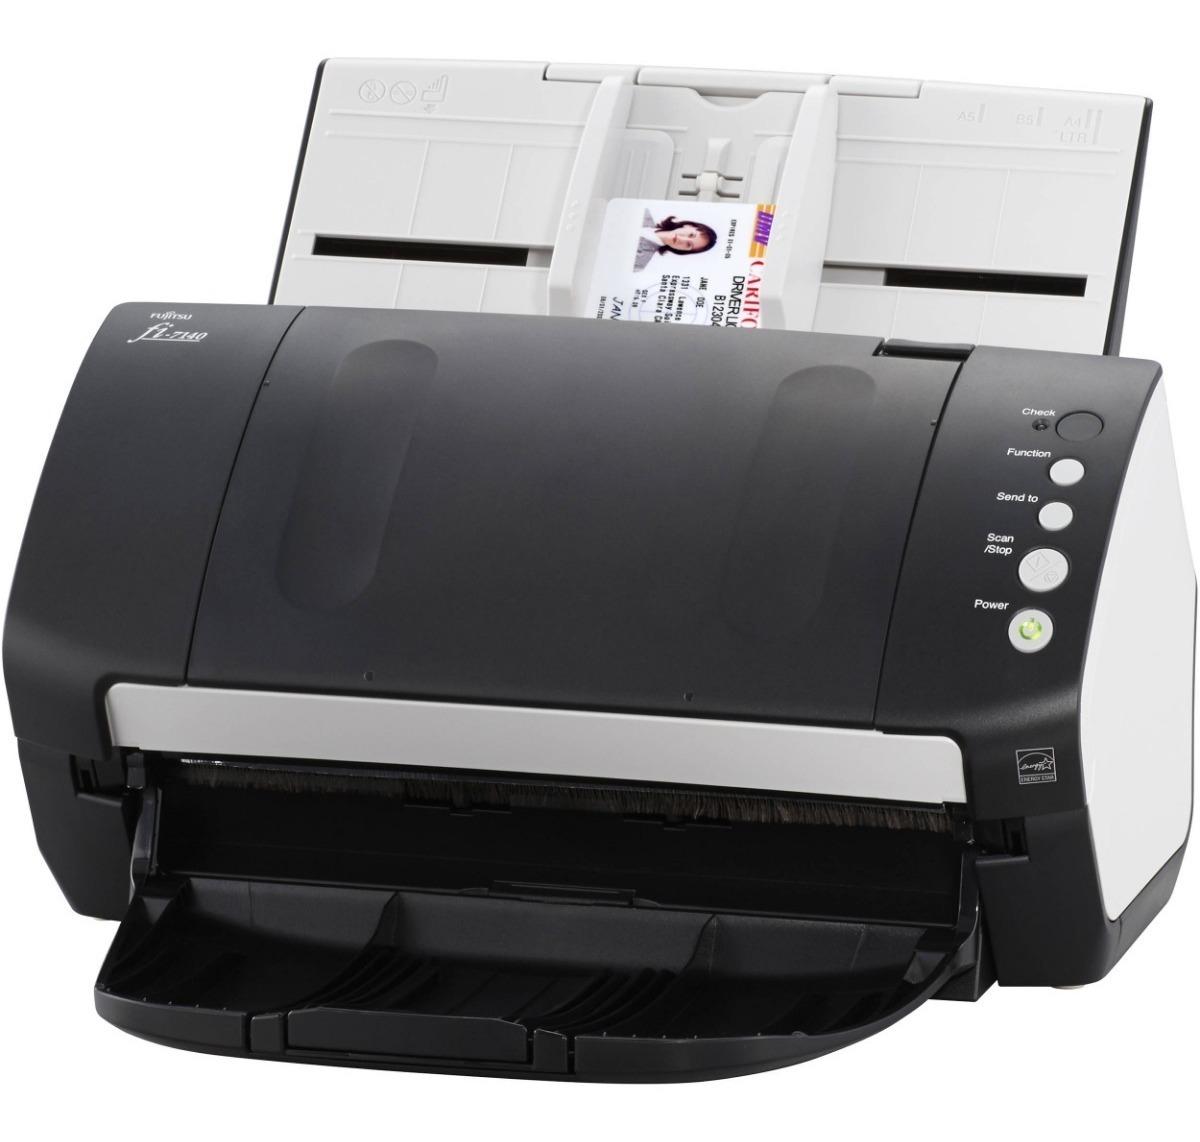 Foto Produto Scanner Fujitsu Fi-7140, 40ppm, Duplex (Frente e Verso)